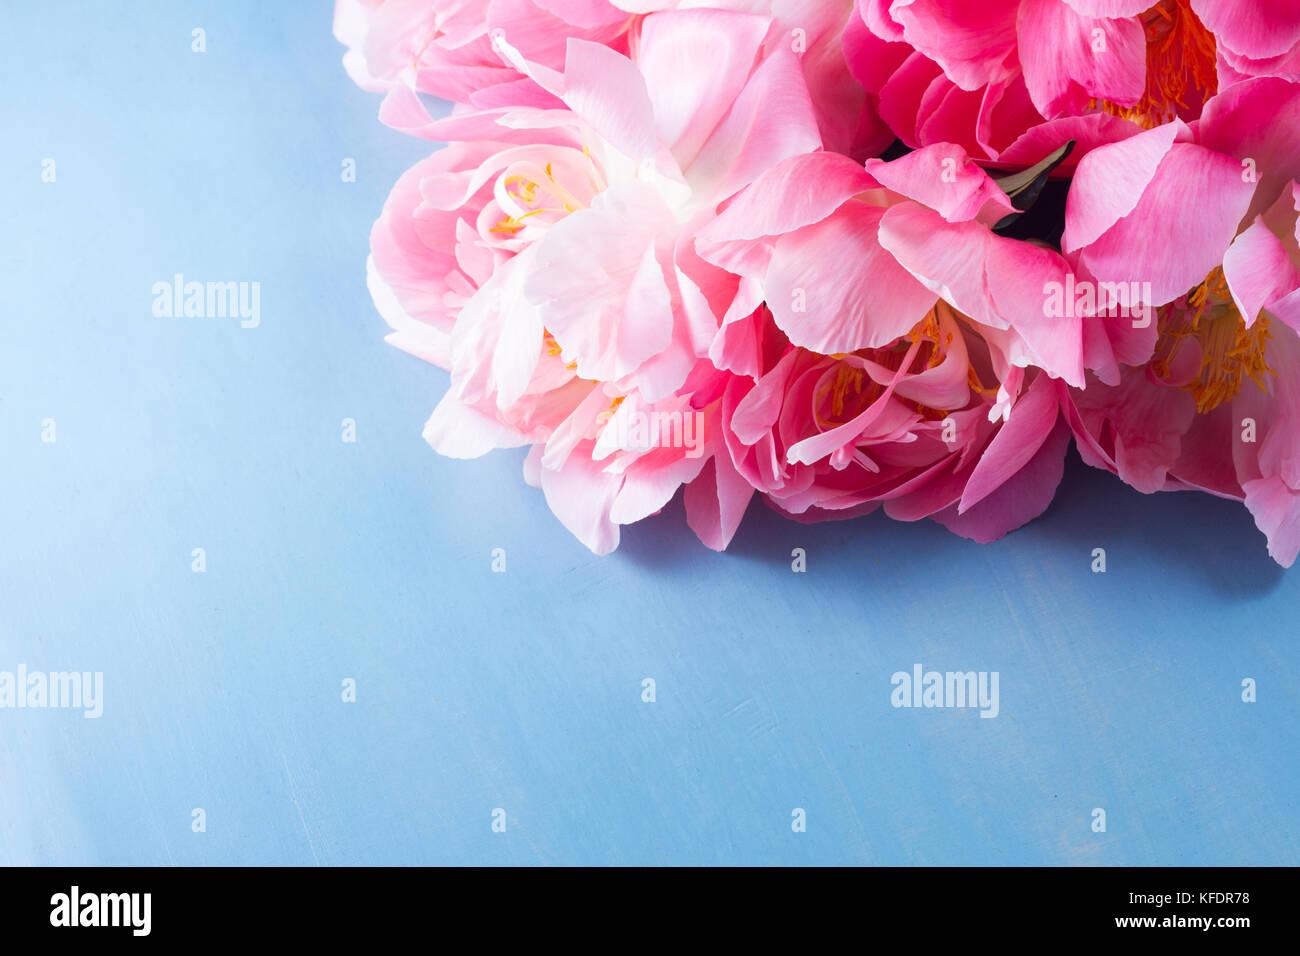 Peony Dark Pink Flowers Bouquet Close Up On Blue Background Stock Photo Alamy